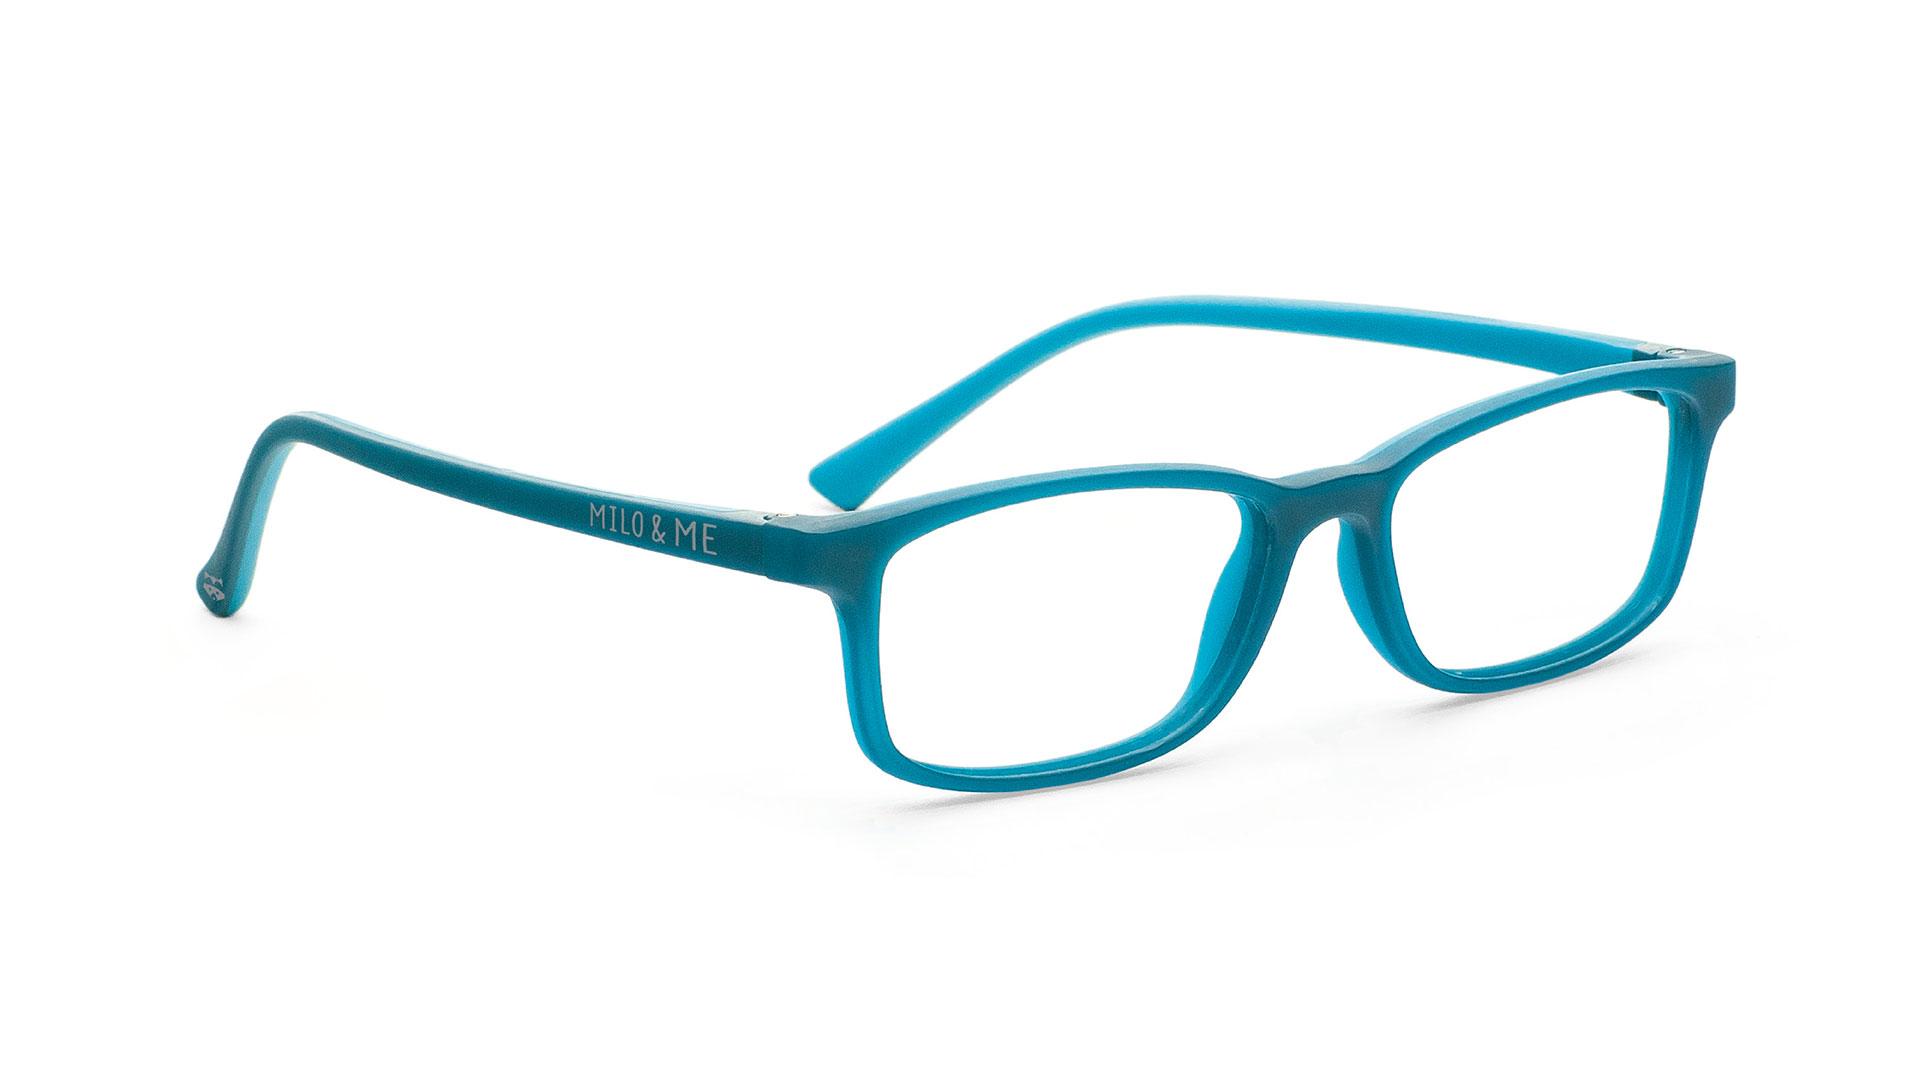 Dark Turquoise Turquoise H85031-05 - Milo & Me Eyewear - Optimum RX Lens Specialists